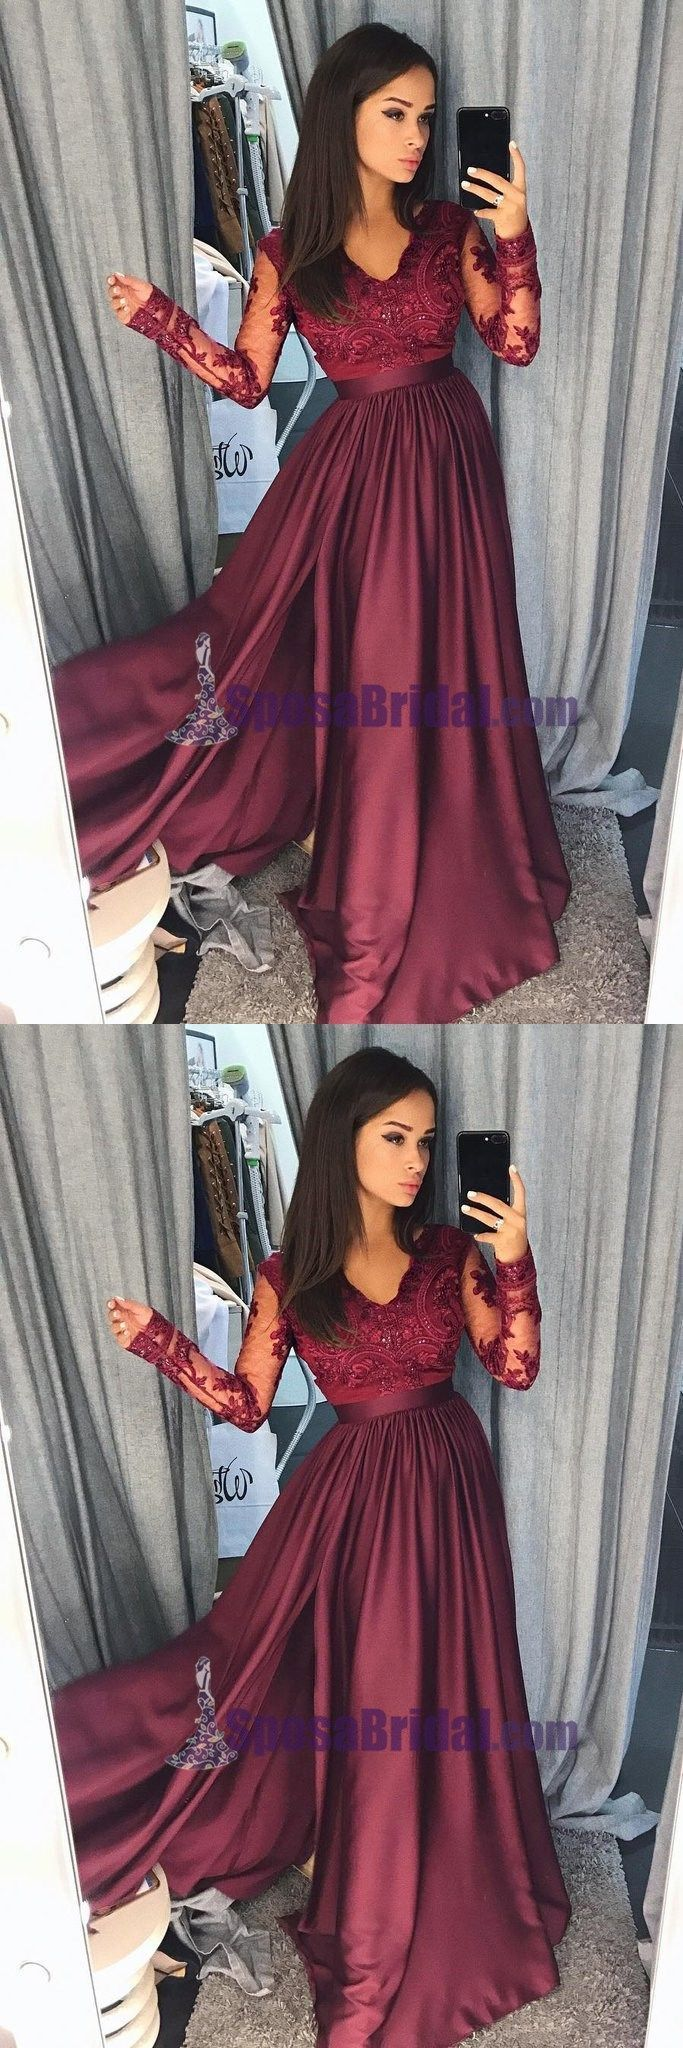 Charming long sleeves v neck top lace chiffon navy grey burgundy